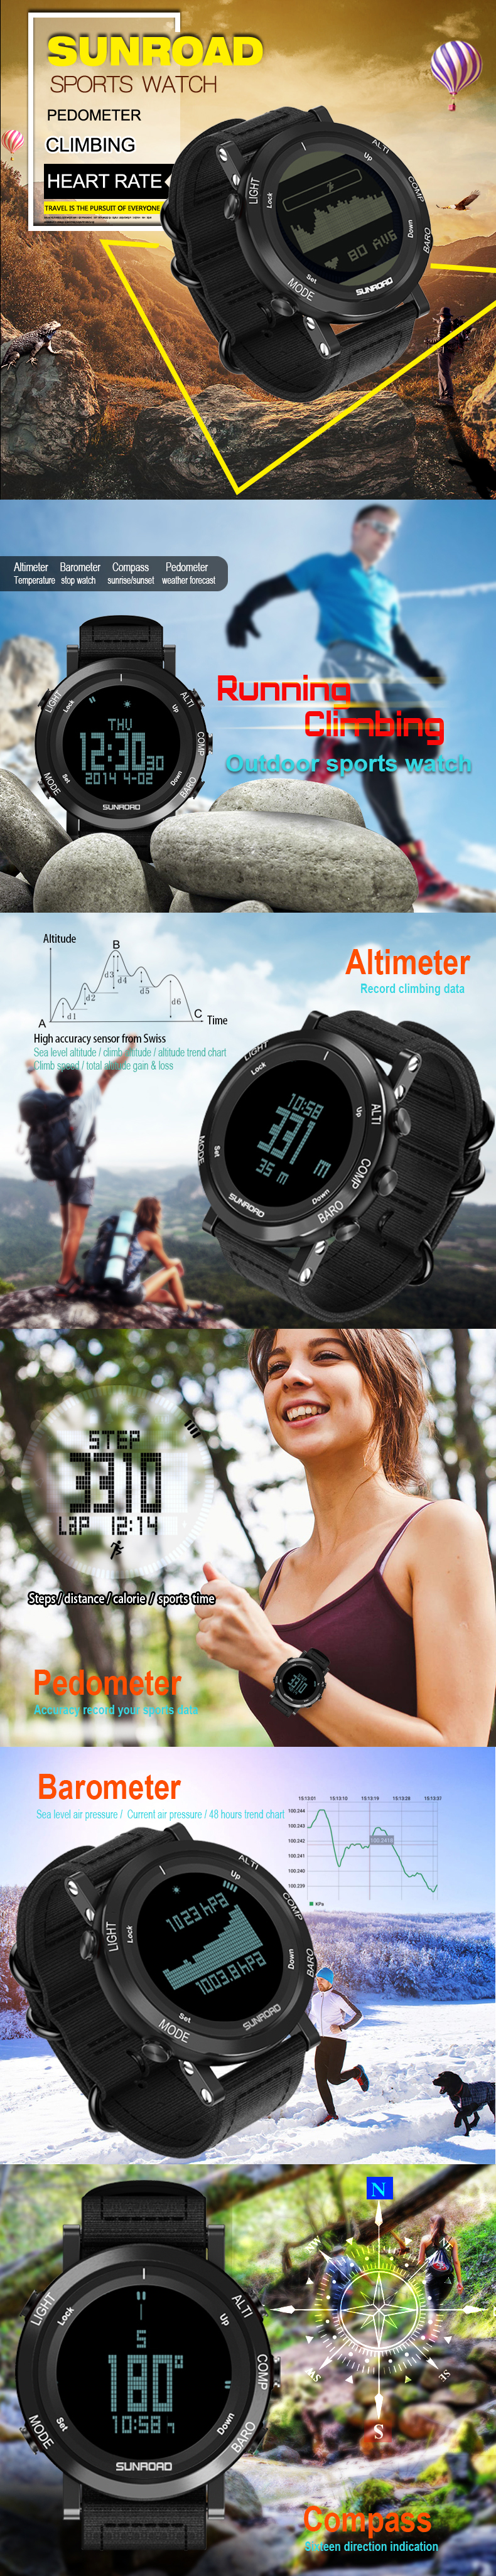 SUNROAD FR922 Heart rate sports watch description photo 01